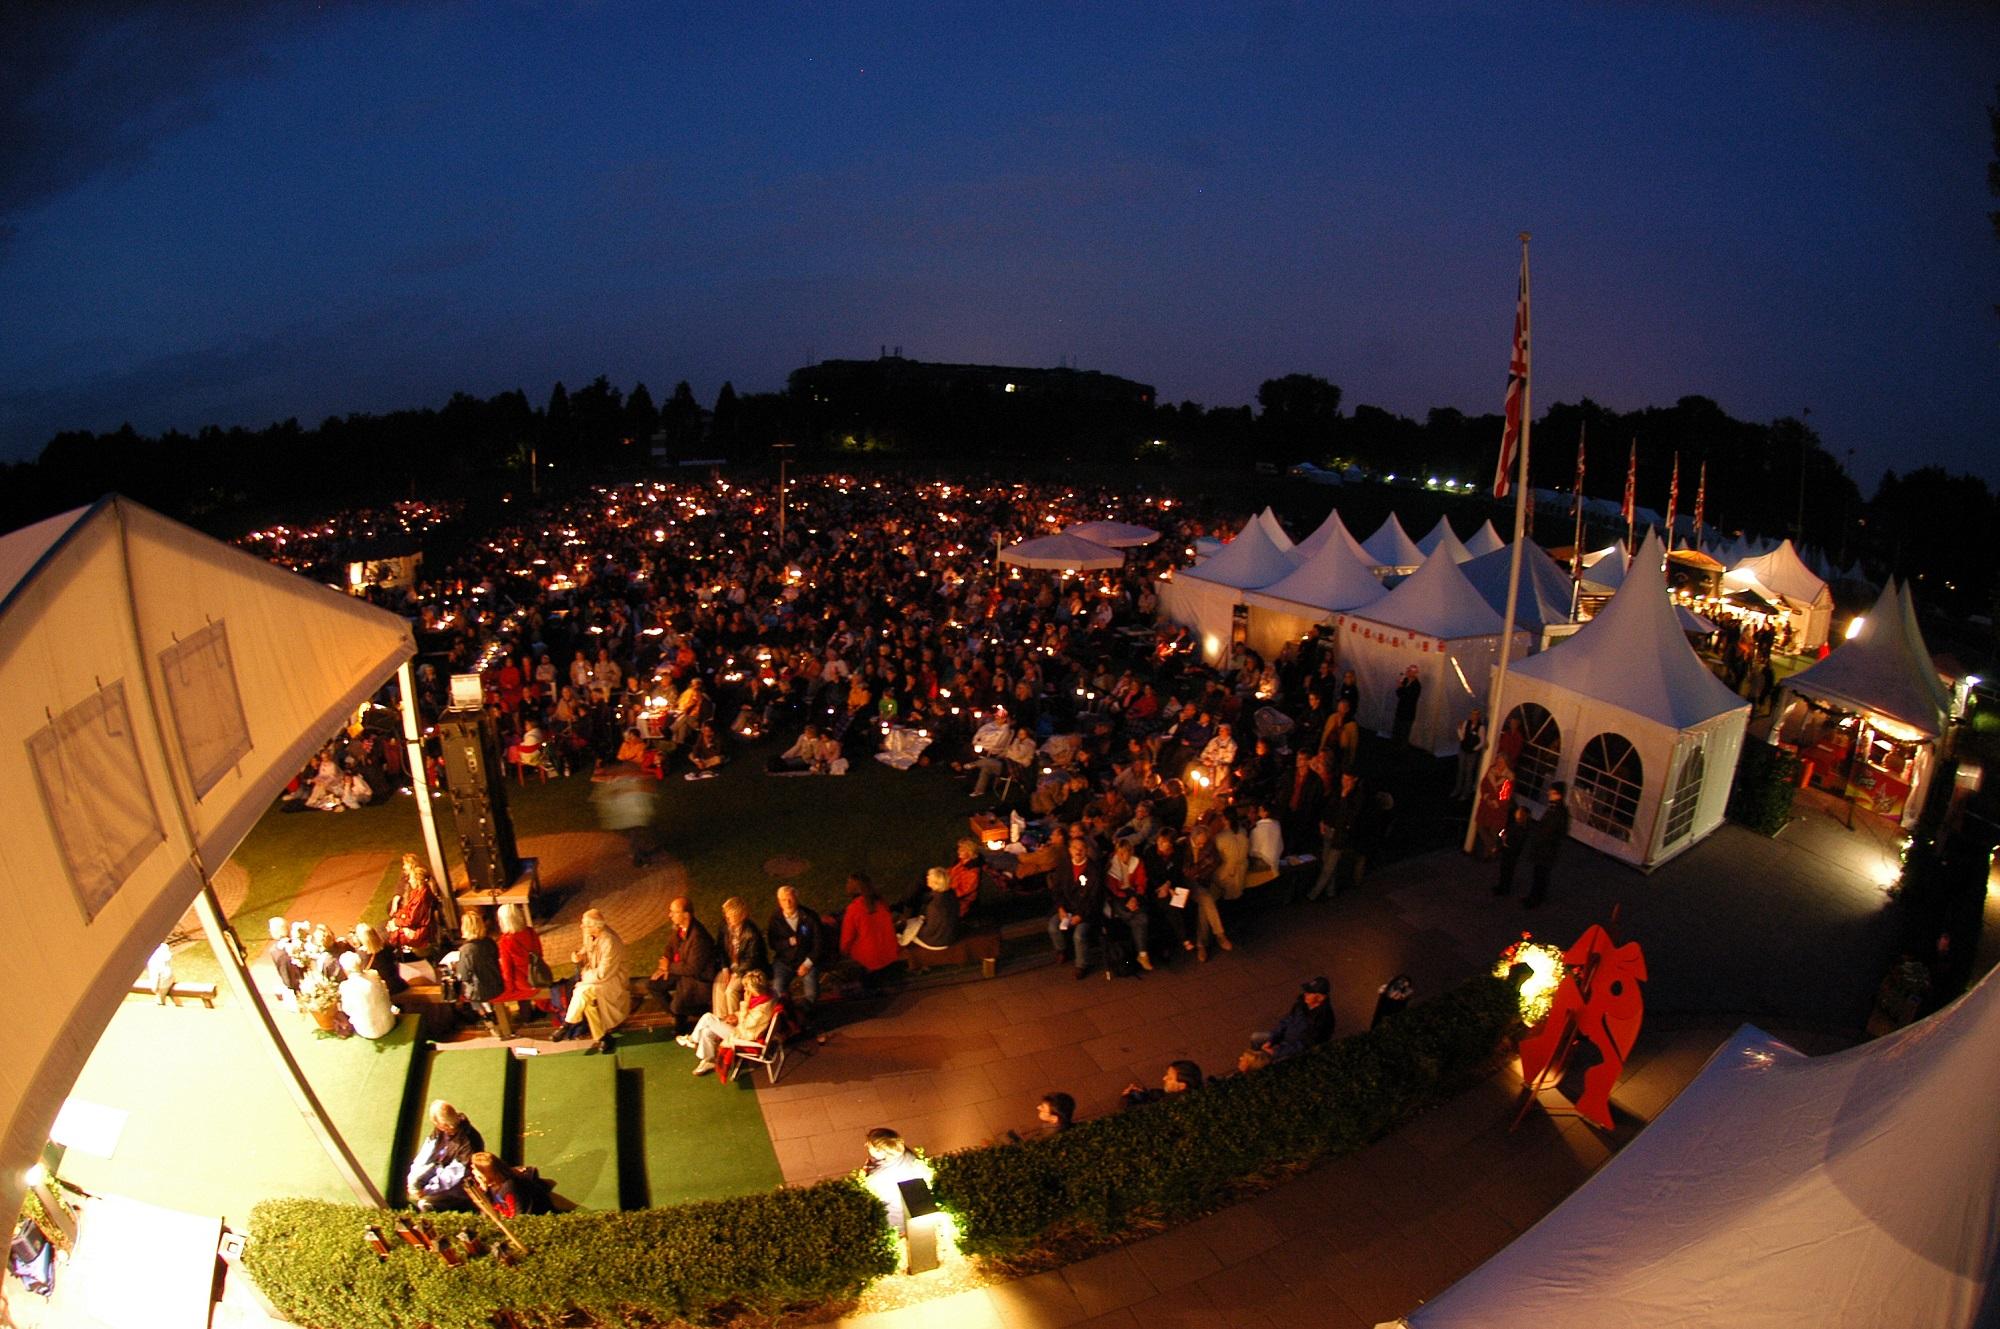 London Festival Opera Al Fresco Performance Hamburg Polo Ground